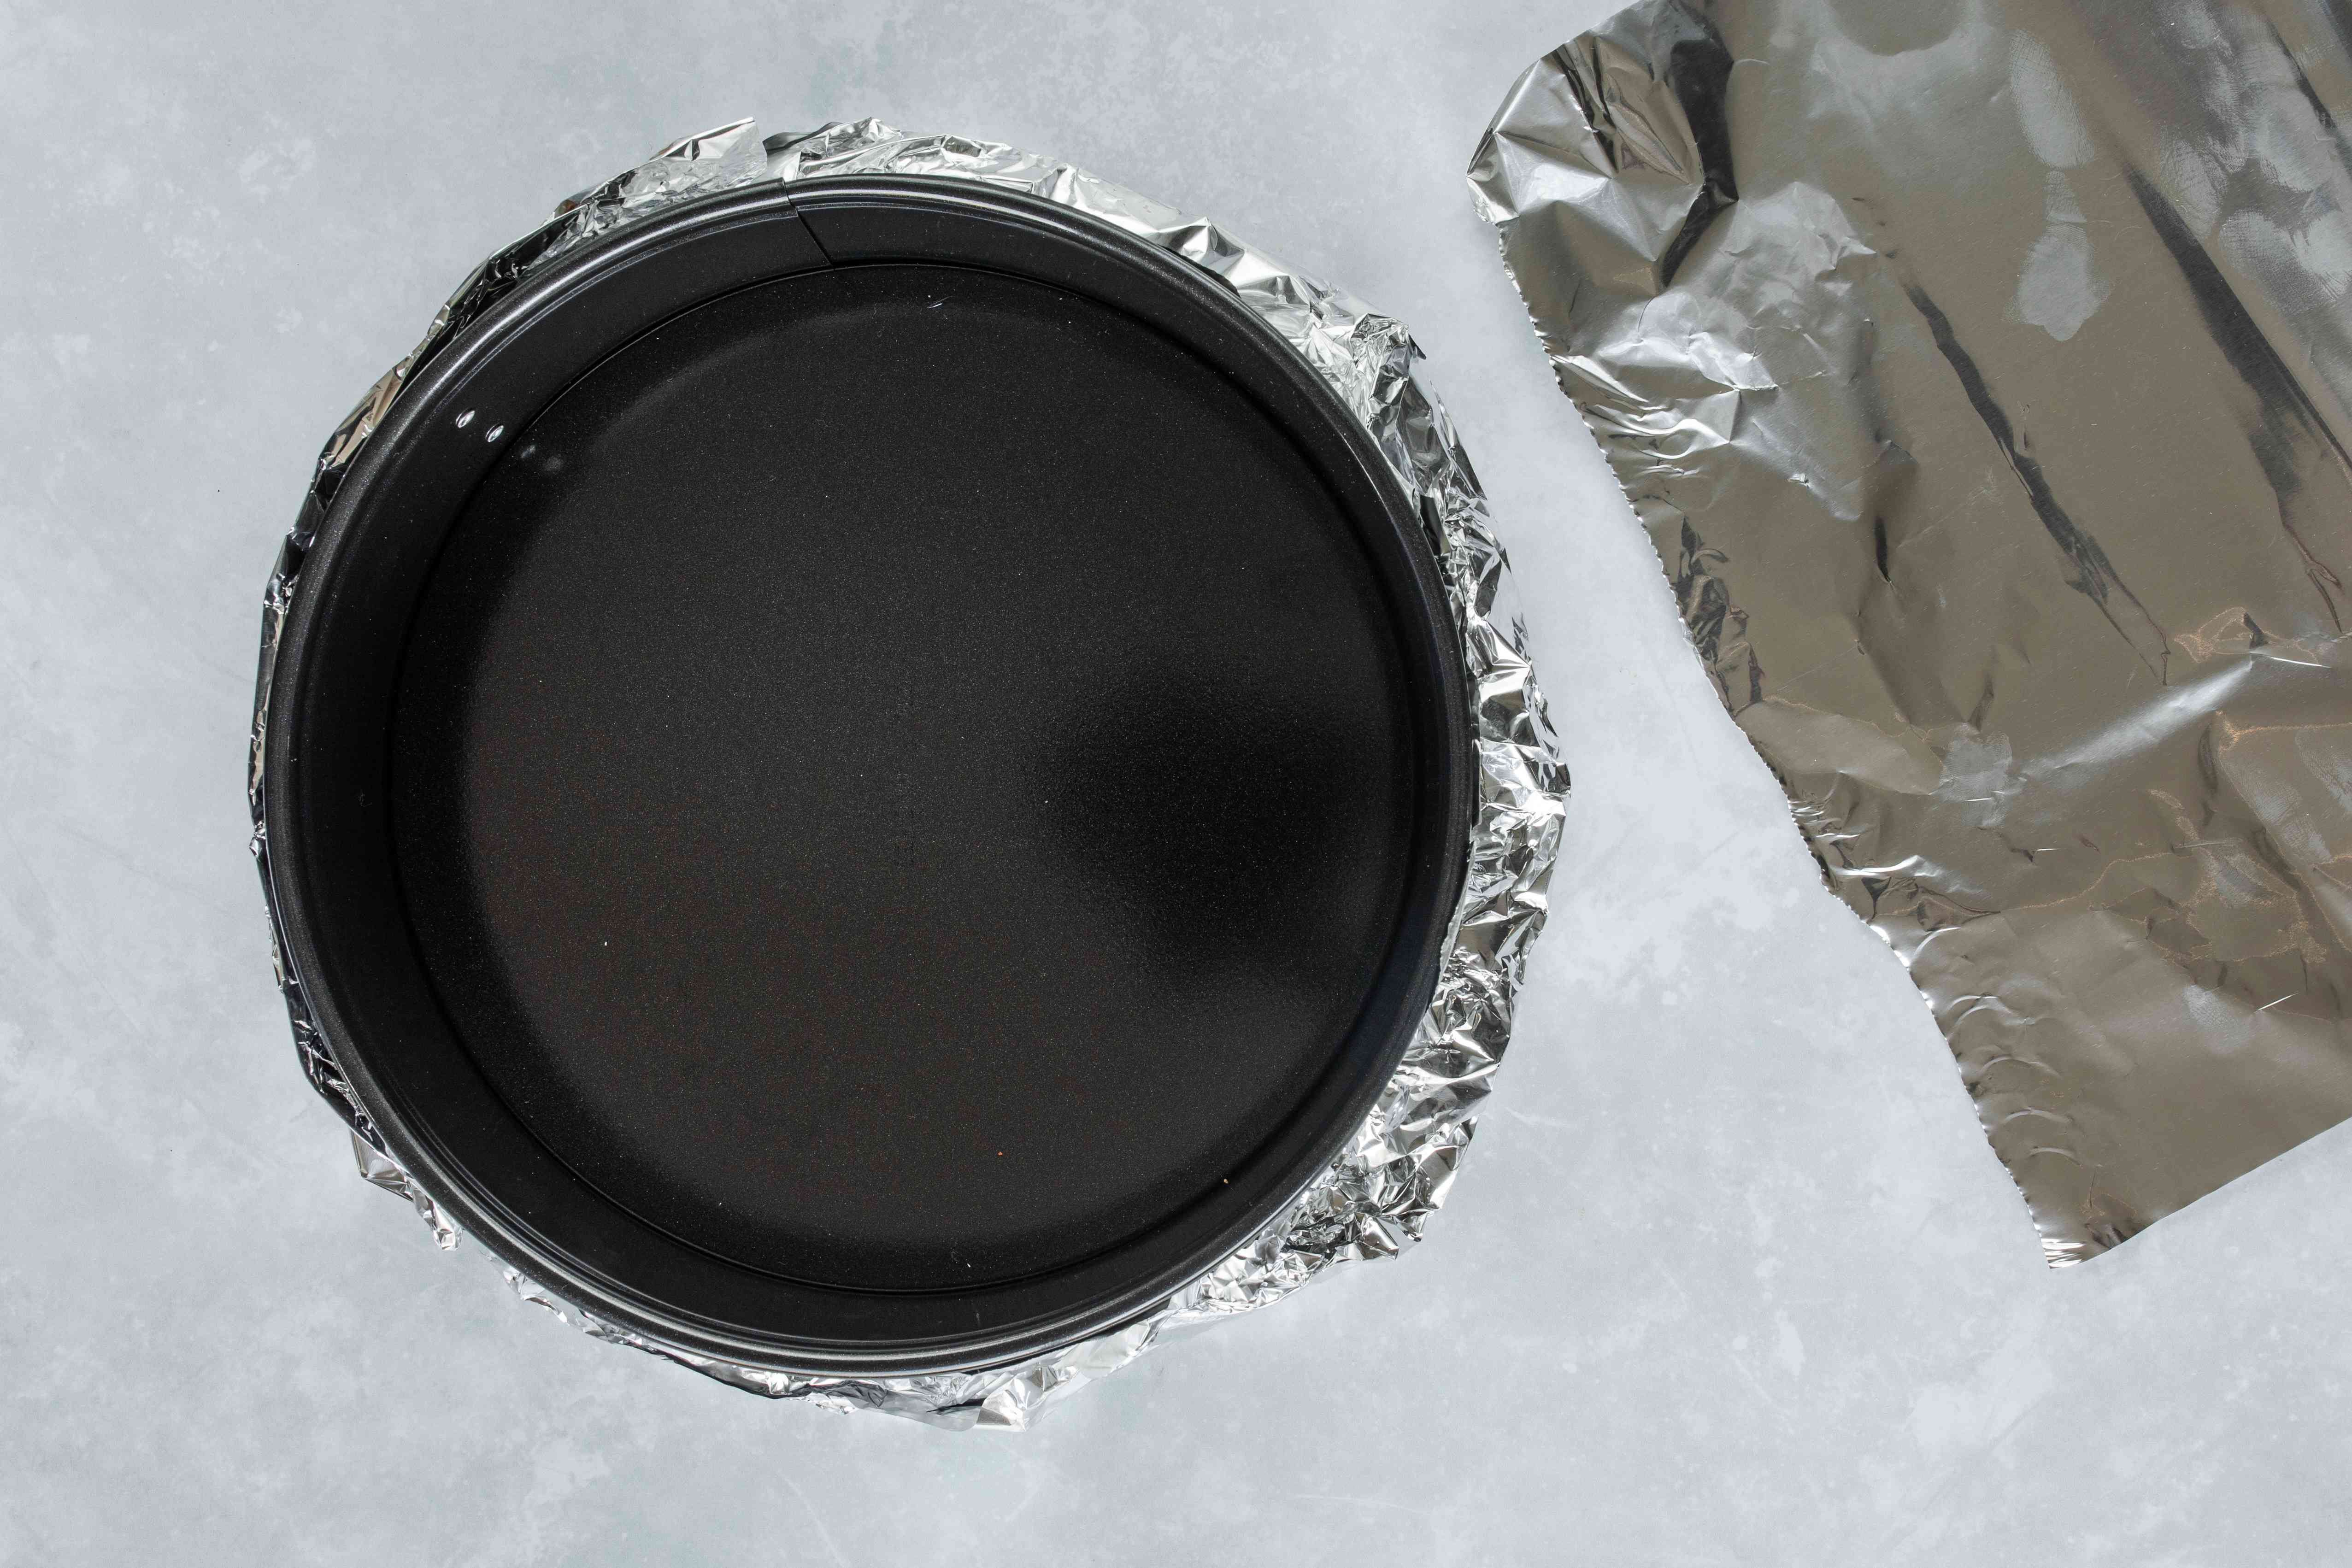 Wrap bottom of pan